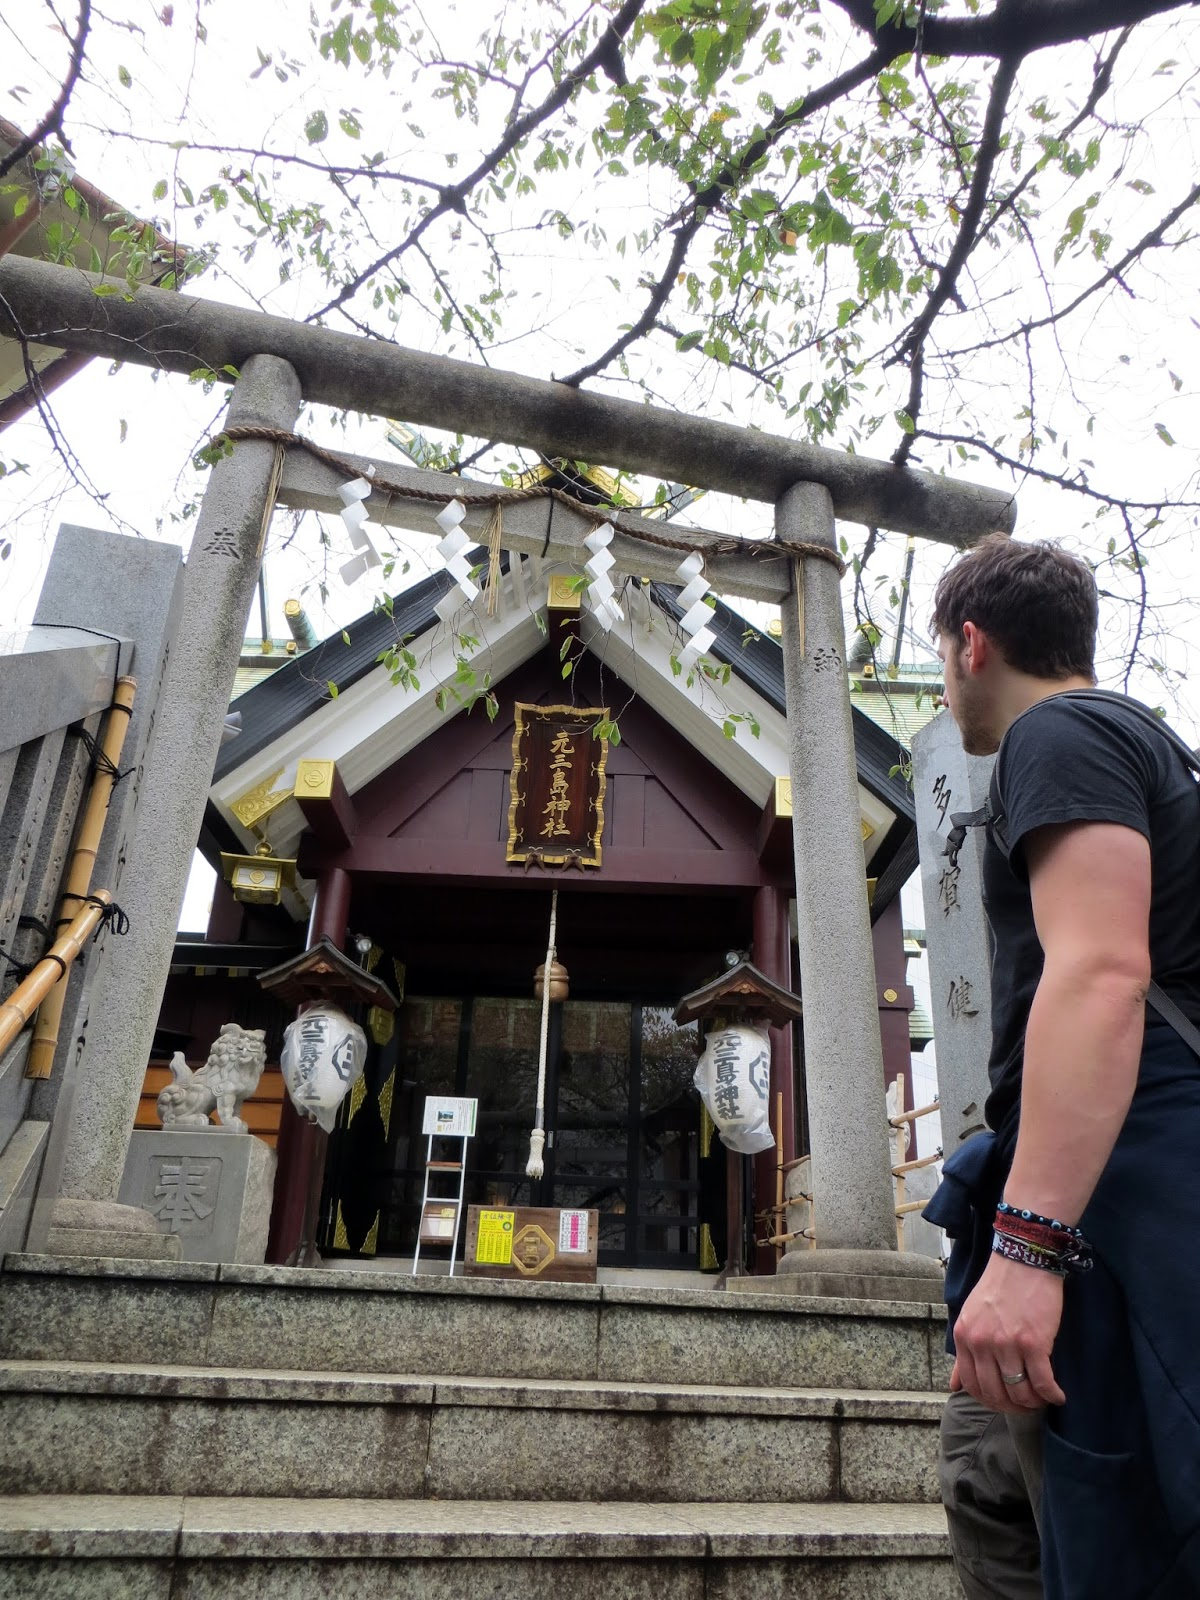 Small shinto shrine, tokyo, Alley way tokyo, streets japan, vending machines, must do tokyo, Japan